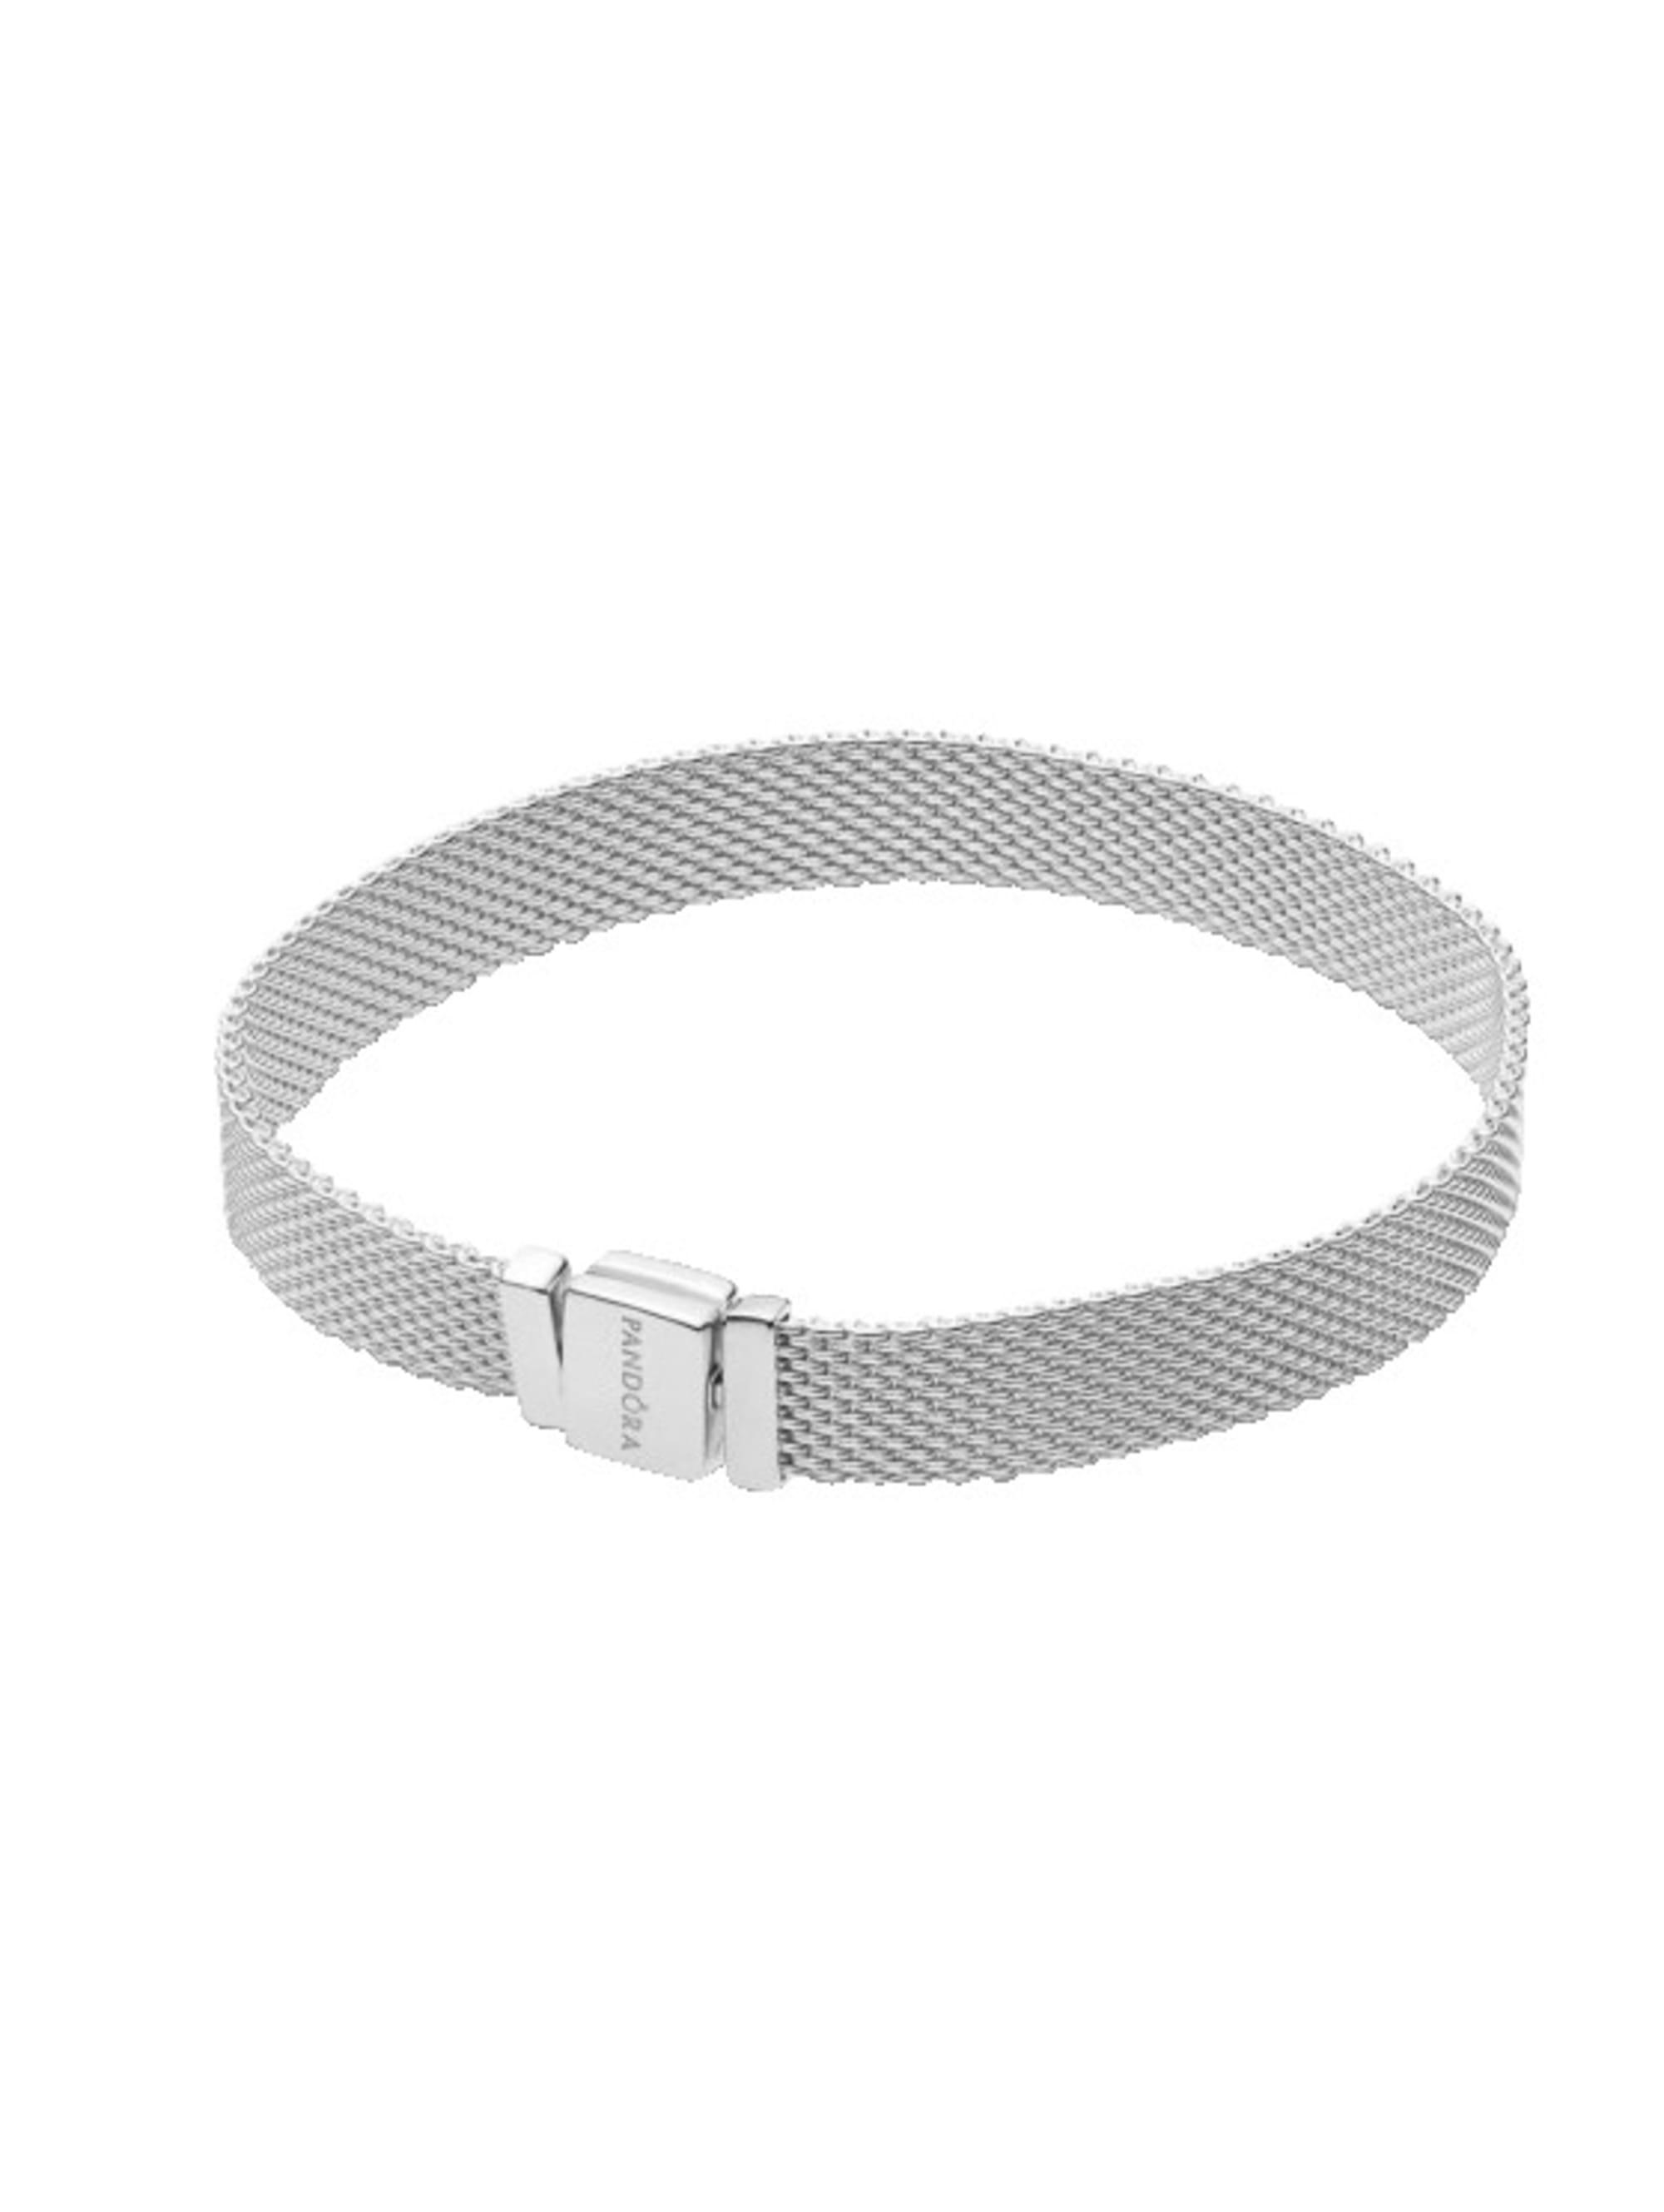 Pandora Armband 597712-20 Ymt7u